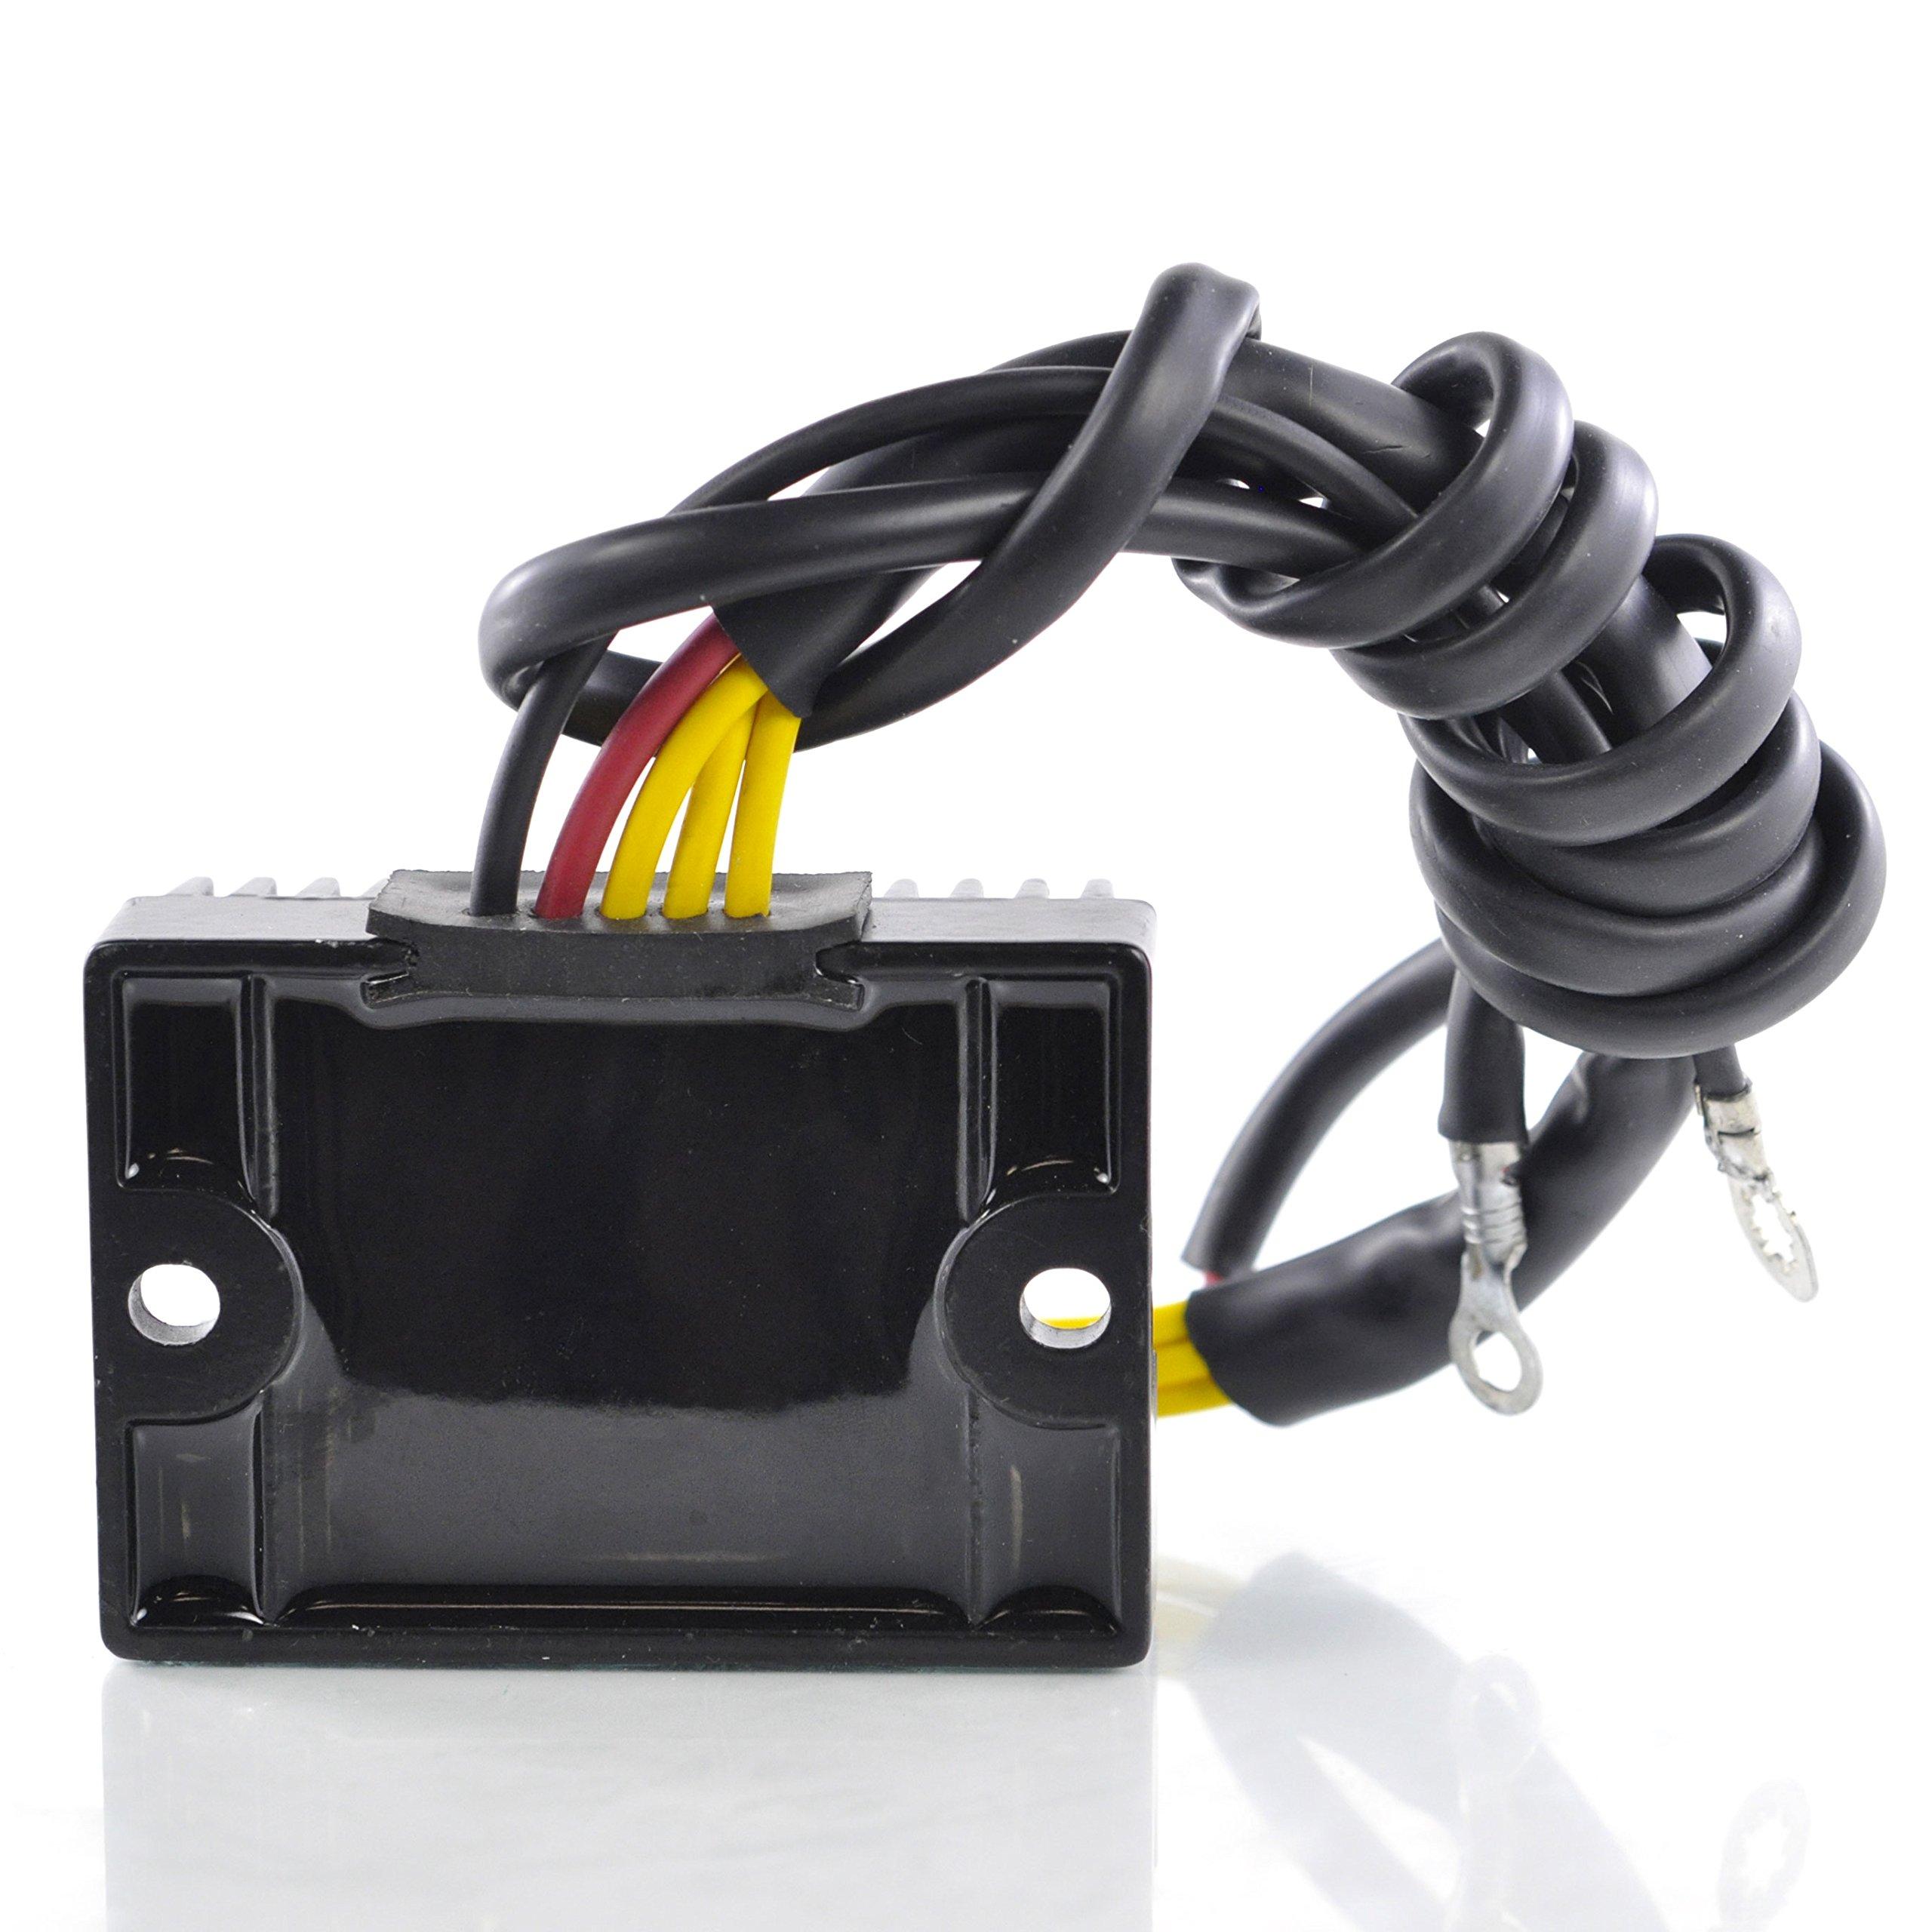 Mosfet Voltage Regulator Rectifier For Victory V92C Cruiser / V92C Deluxe Cruiser / V92SC Sport Cruiser 2001 OEM Repl.# 2410209 by RMSTATOR (Image #2)